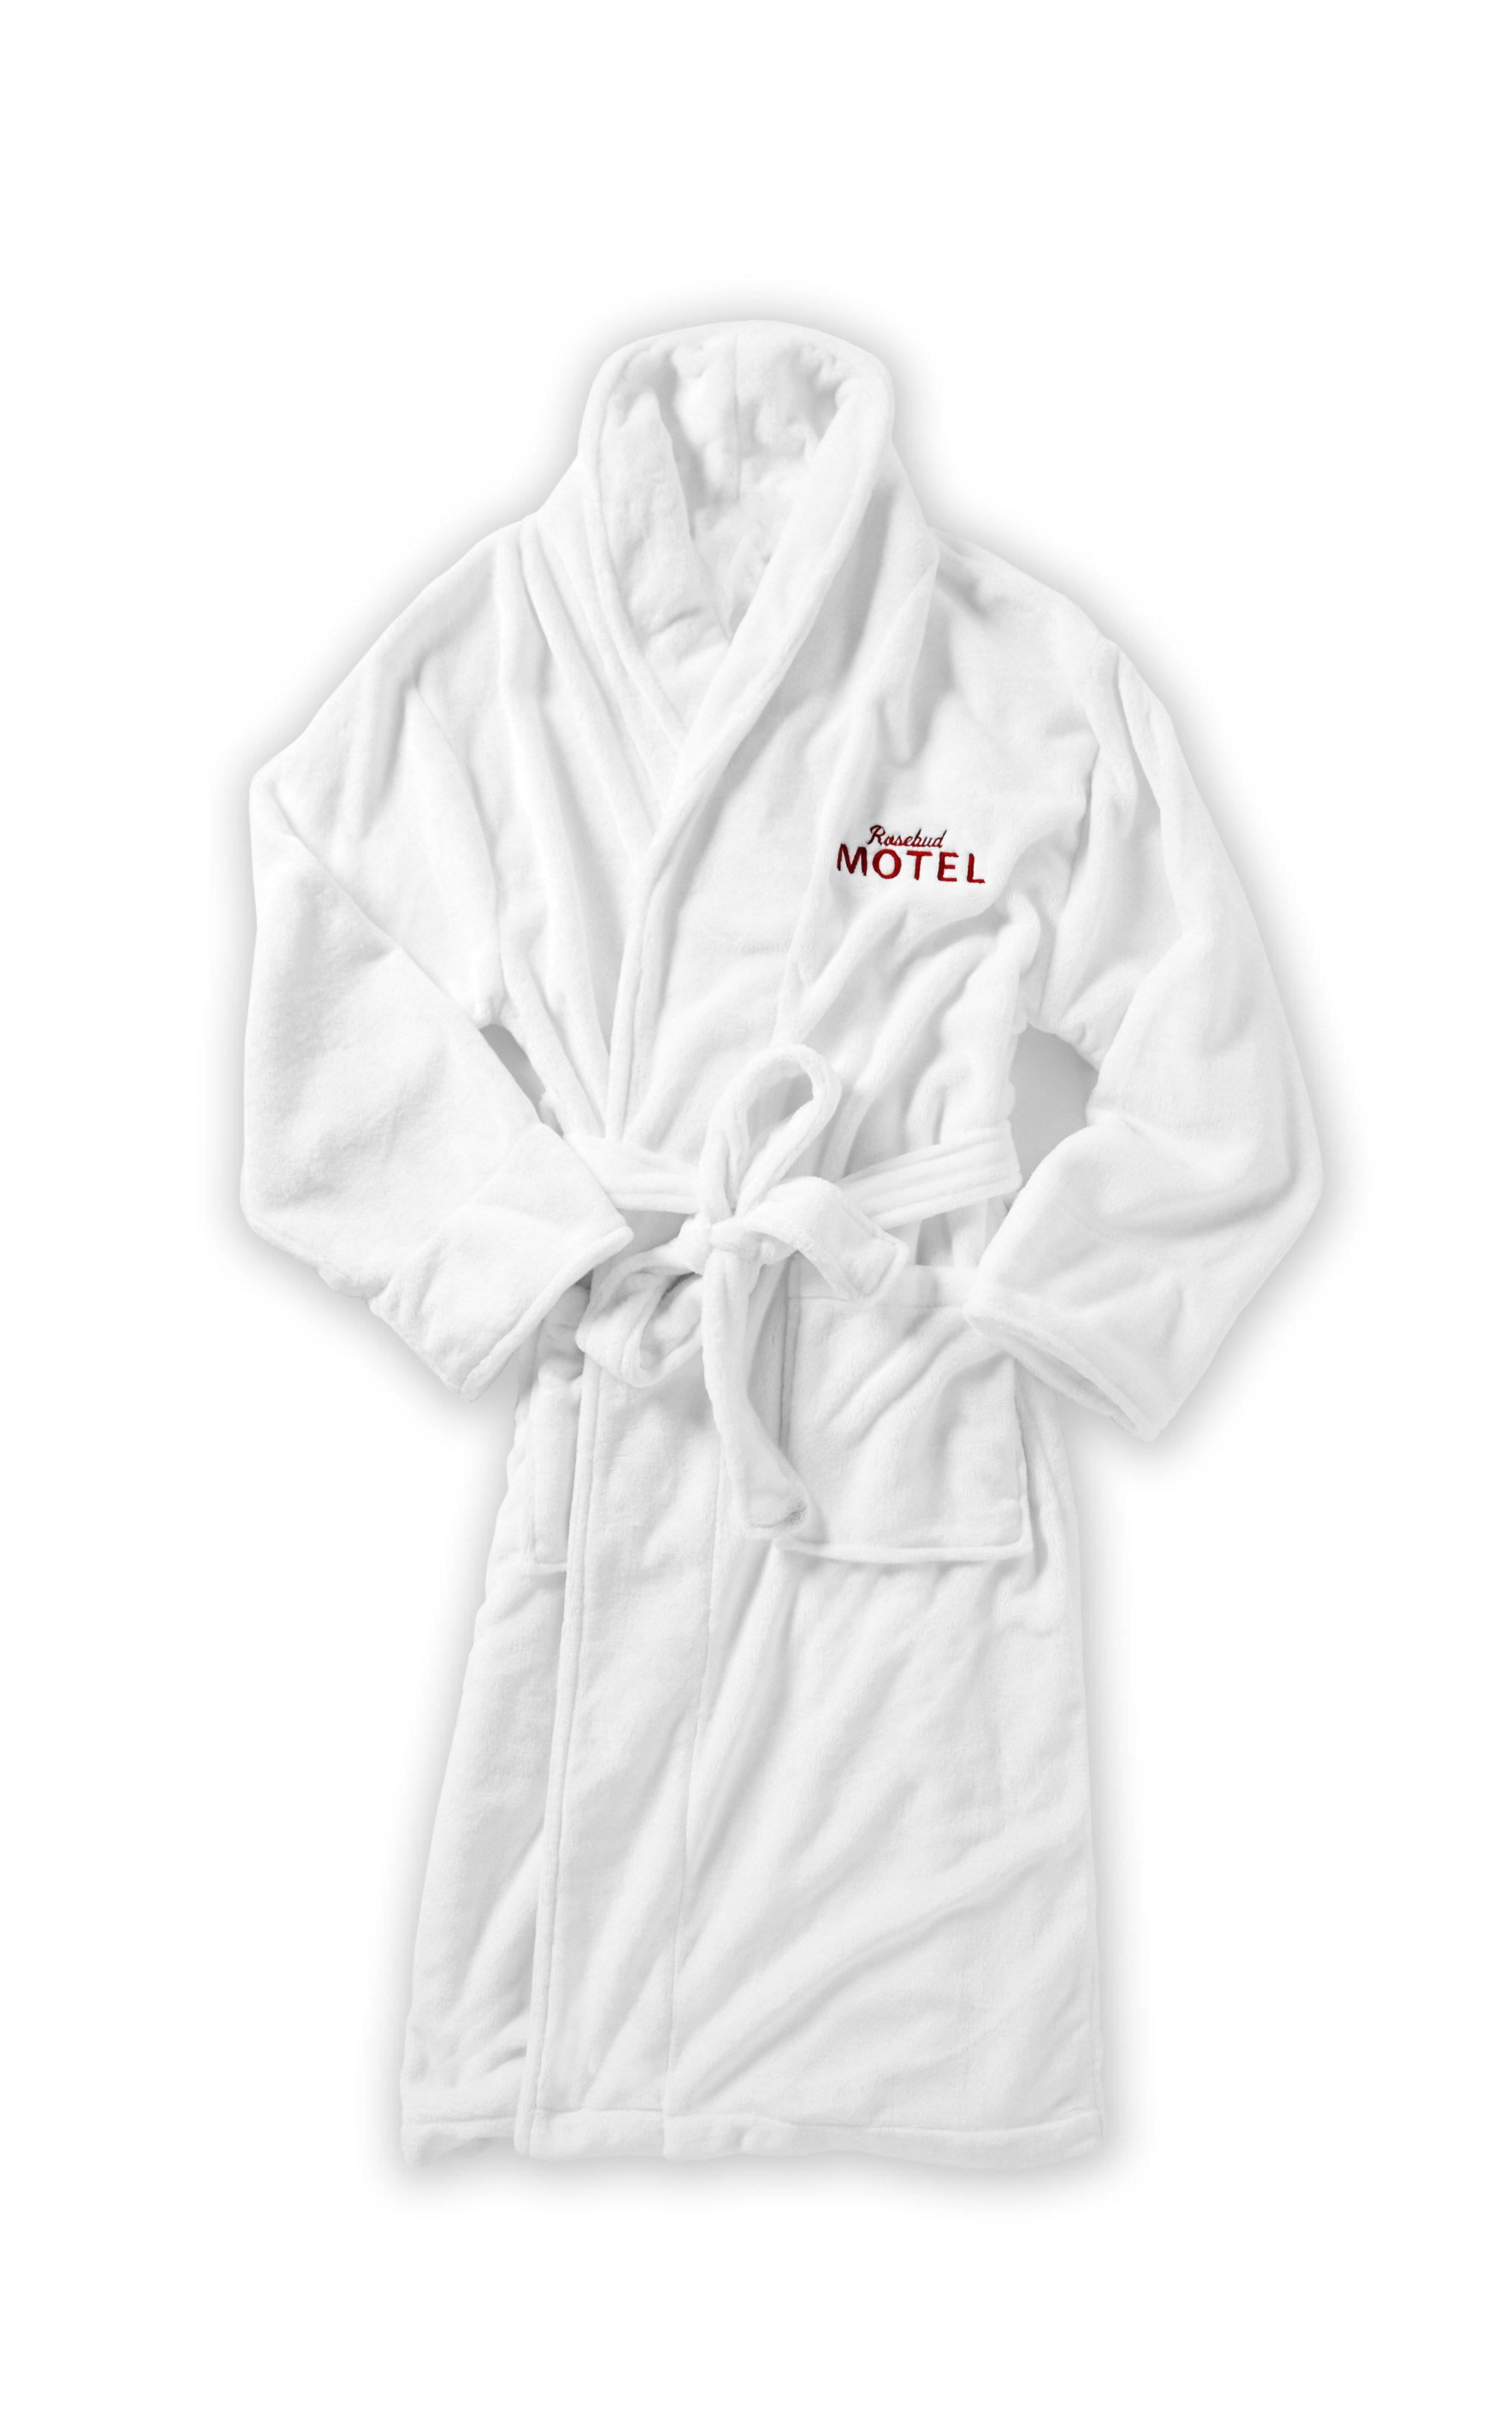 schitt's creek gifts, rosebud motel bathrobe